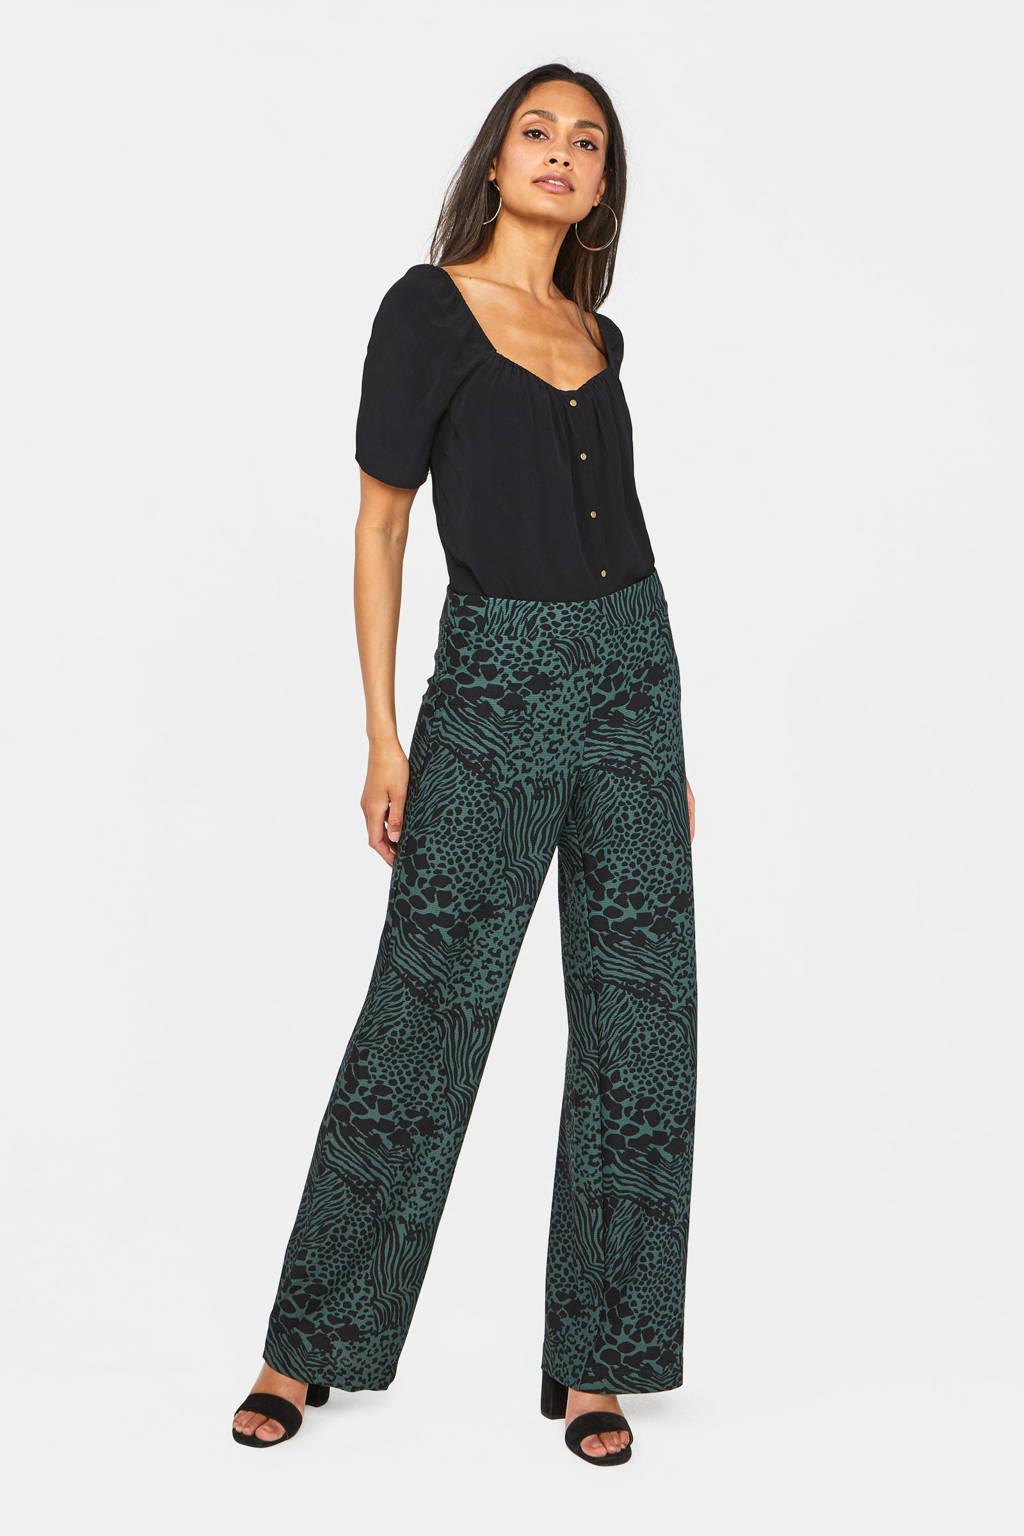 WE Fashion high waist loose fit broek met all over print groen/zwart, Groen/zwart